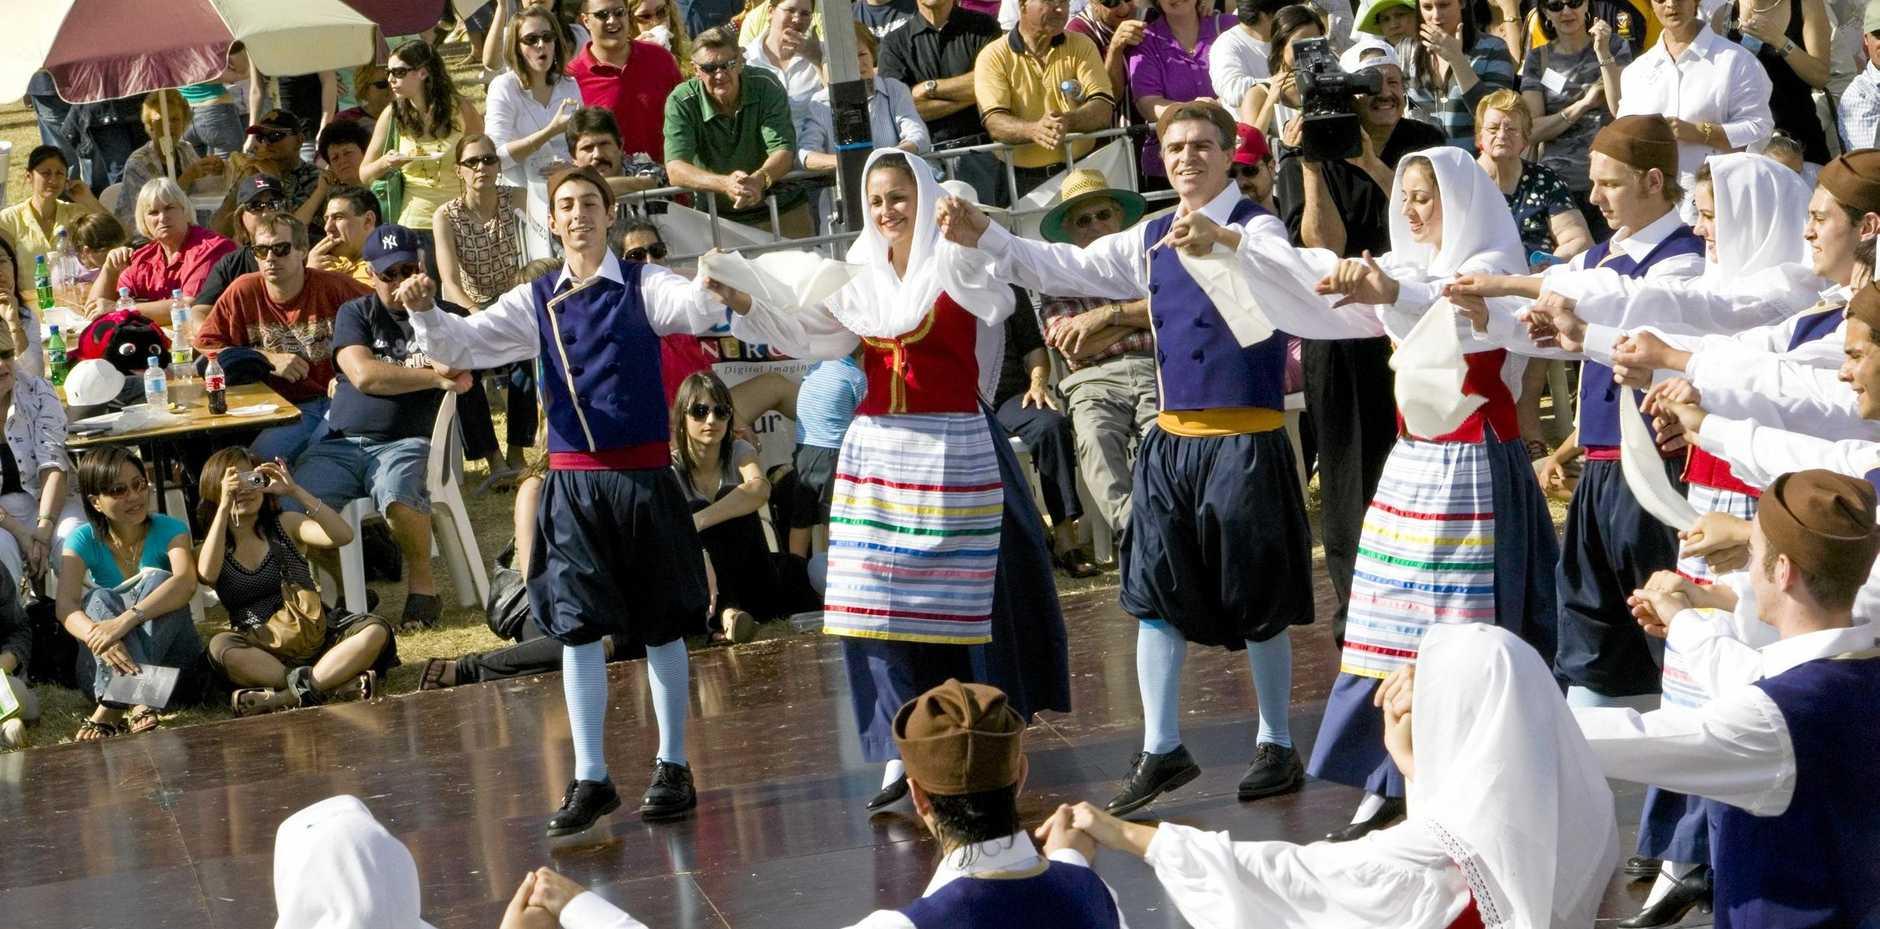 GREEK CELEBRATION: Brisbane's annual Paniyiri Greek Festival is on May 18.